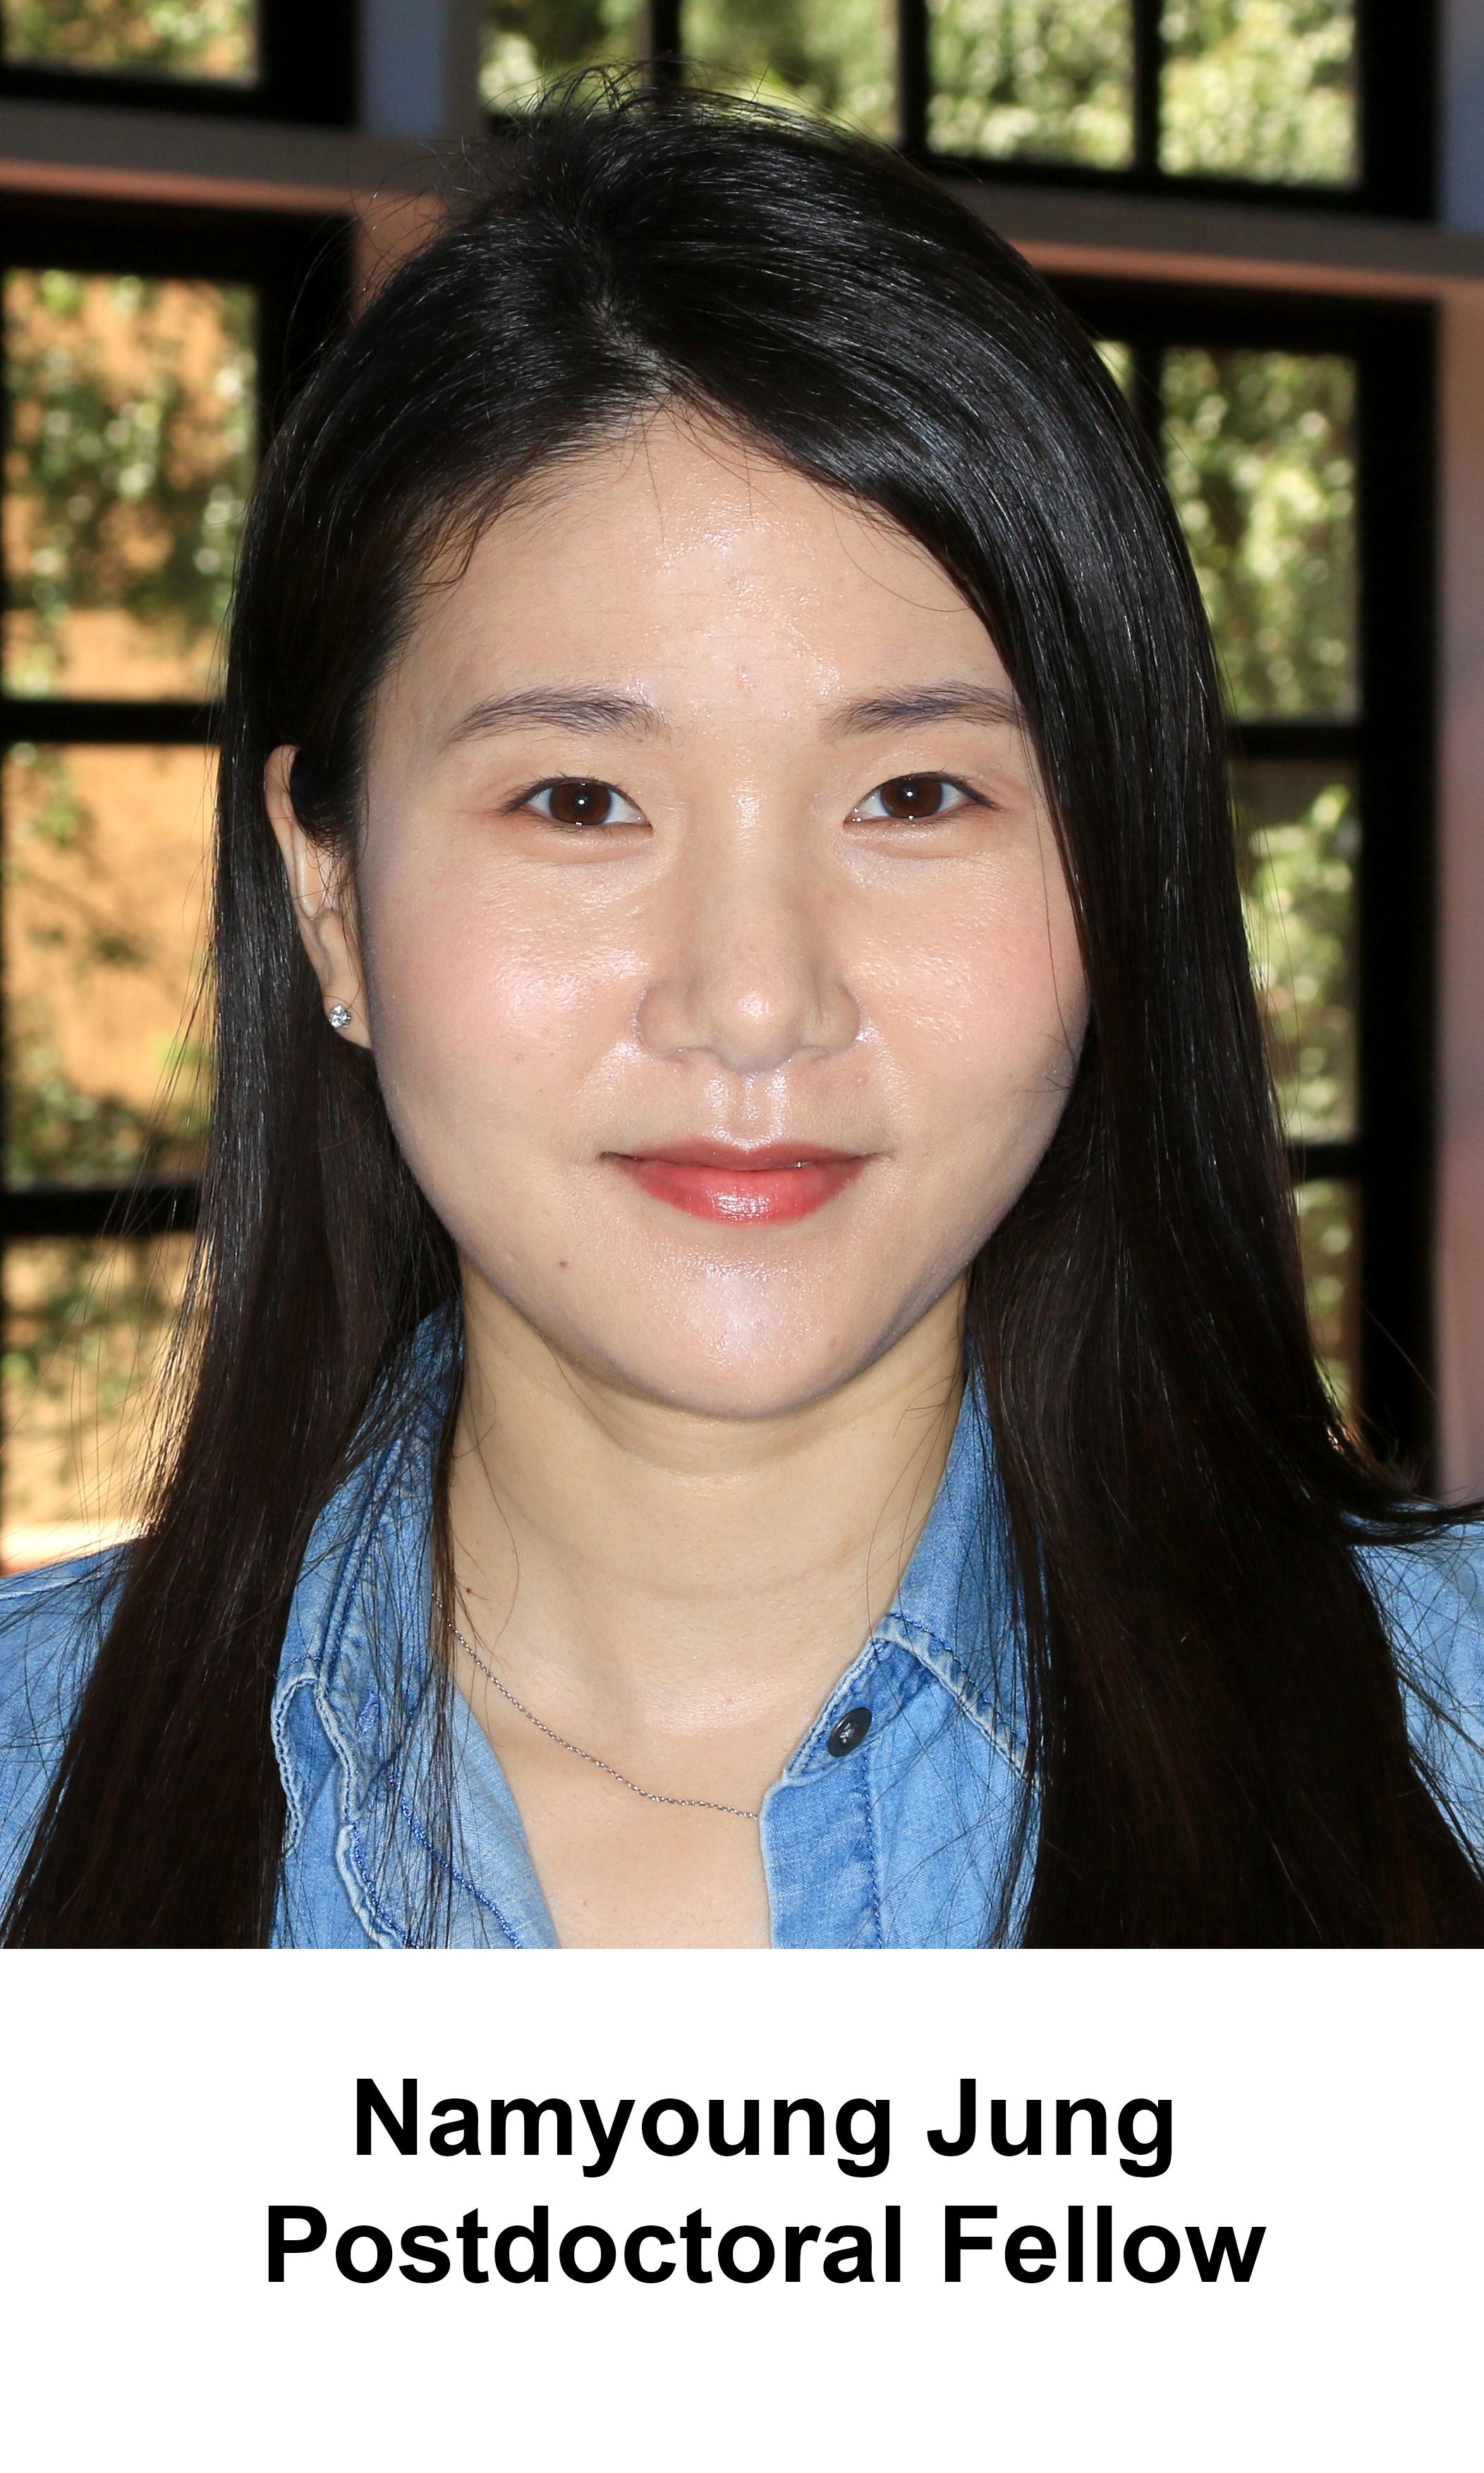 KL.namyoung.jung_150x250.jpg